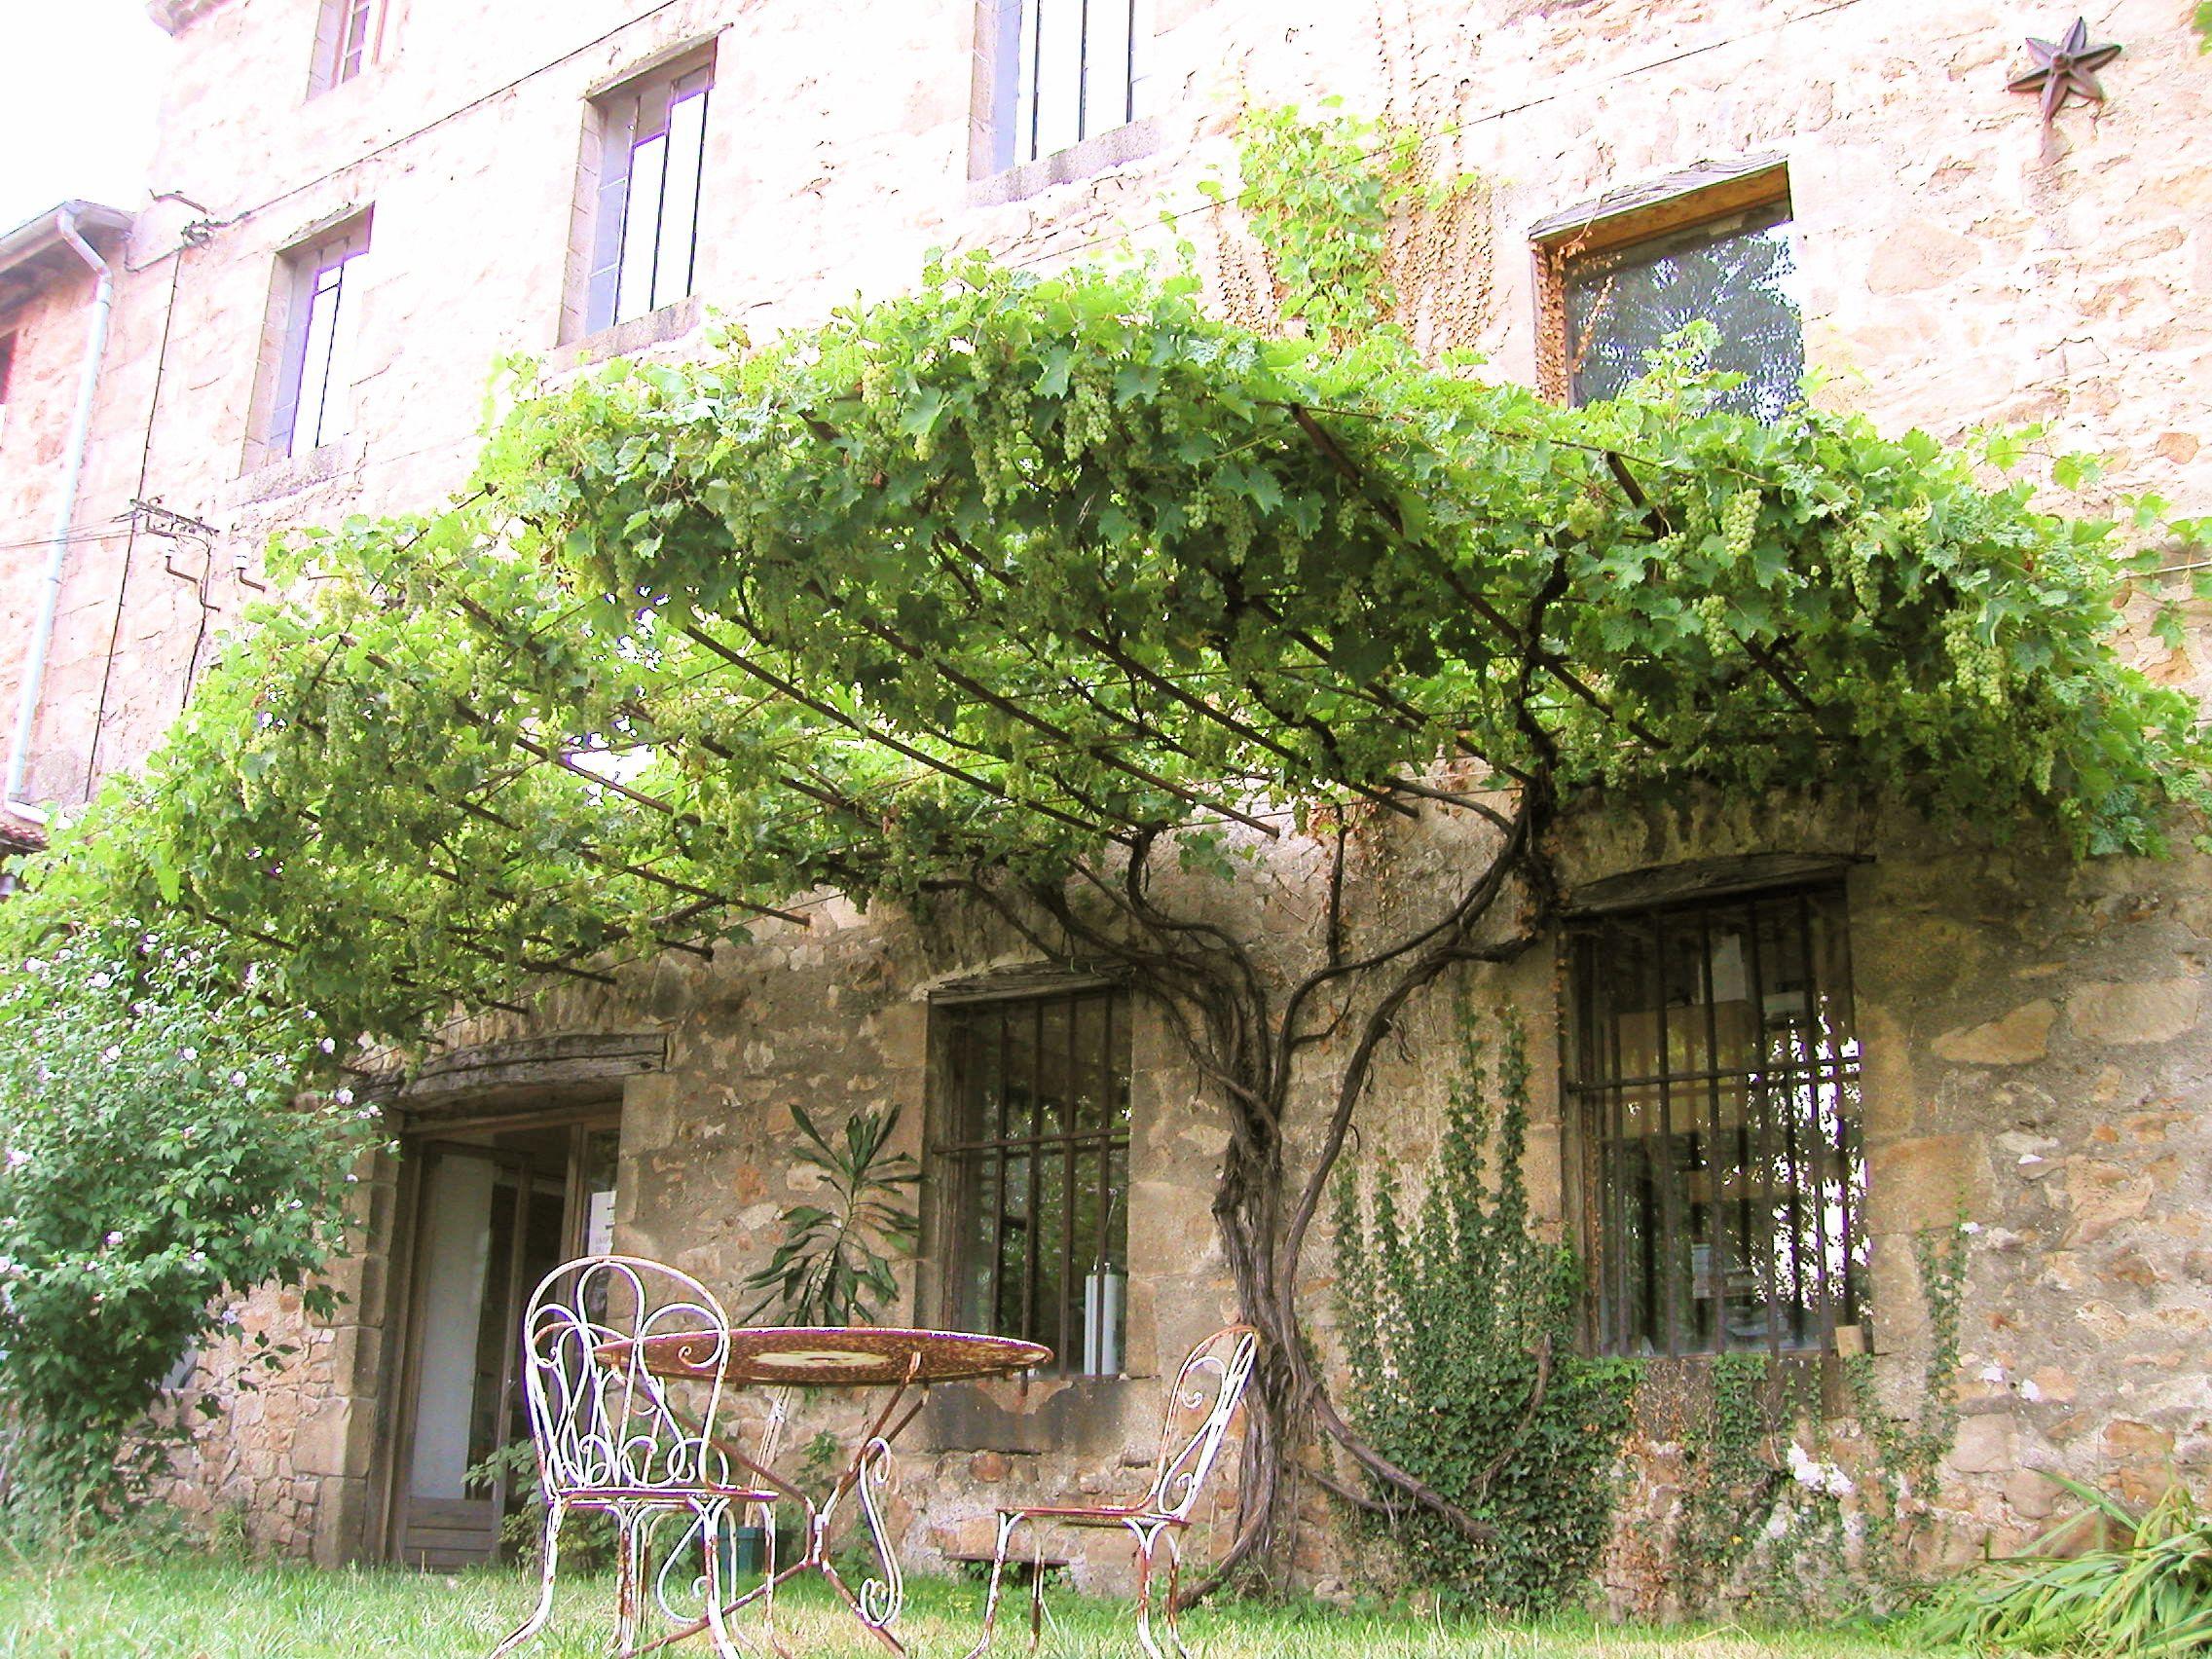 Sculptures v g talis es francis beninca tonnelle pergola for Plante jardin ombre